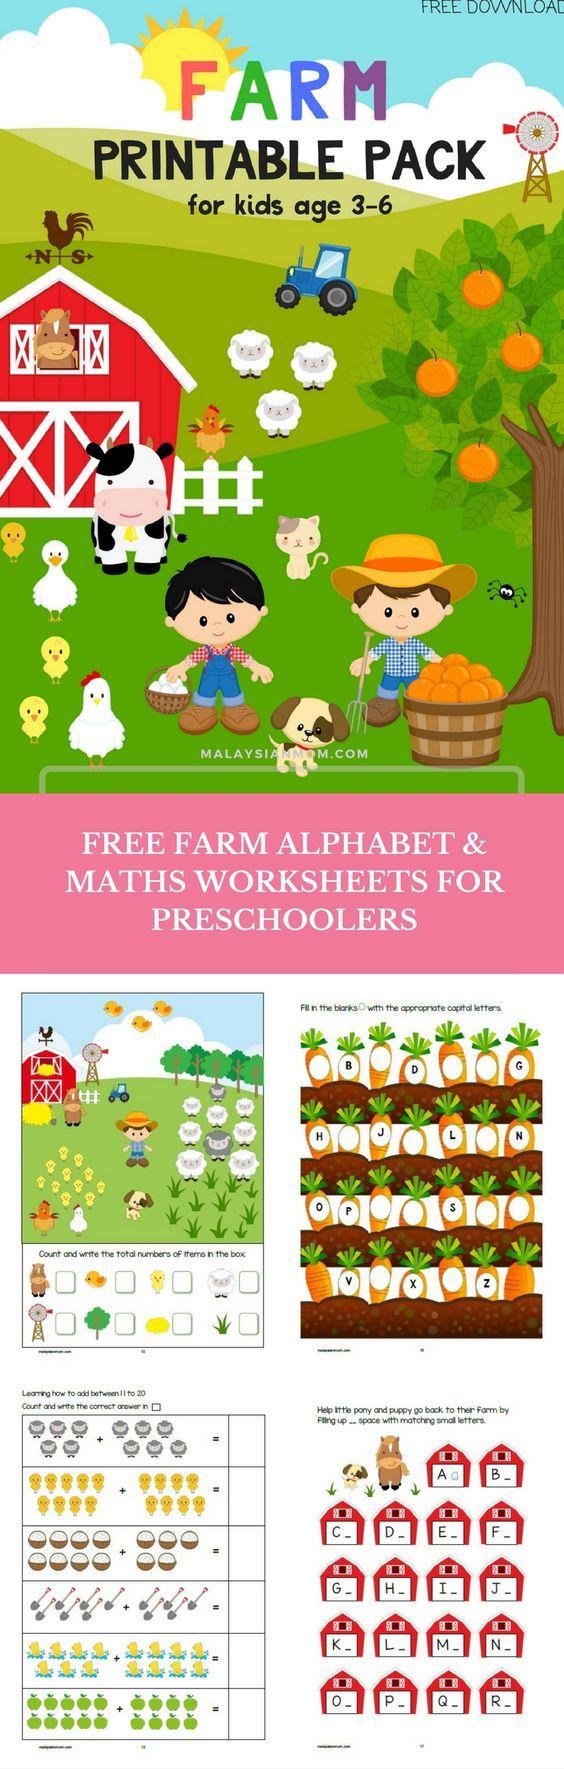 Free Addition Worksheets K 1 Instant Download Free Homeschool Curriculum Homeschool Math Homeschool Kindergarten